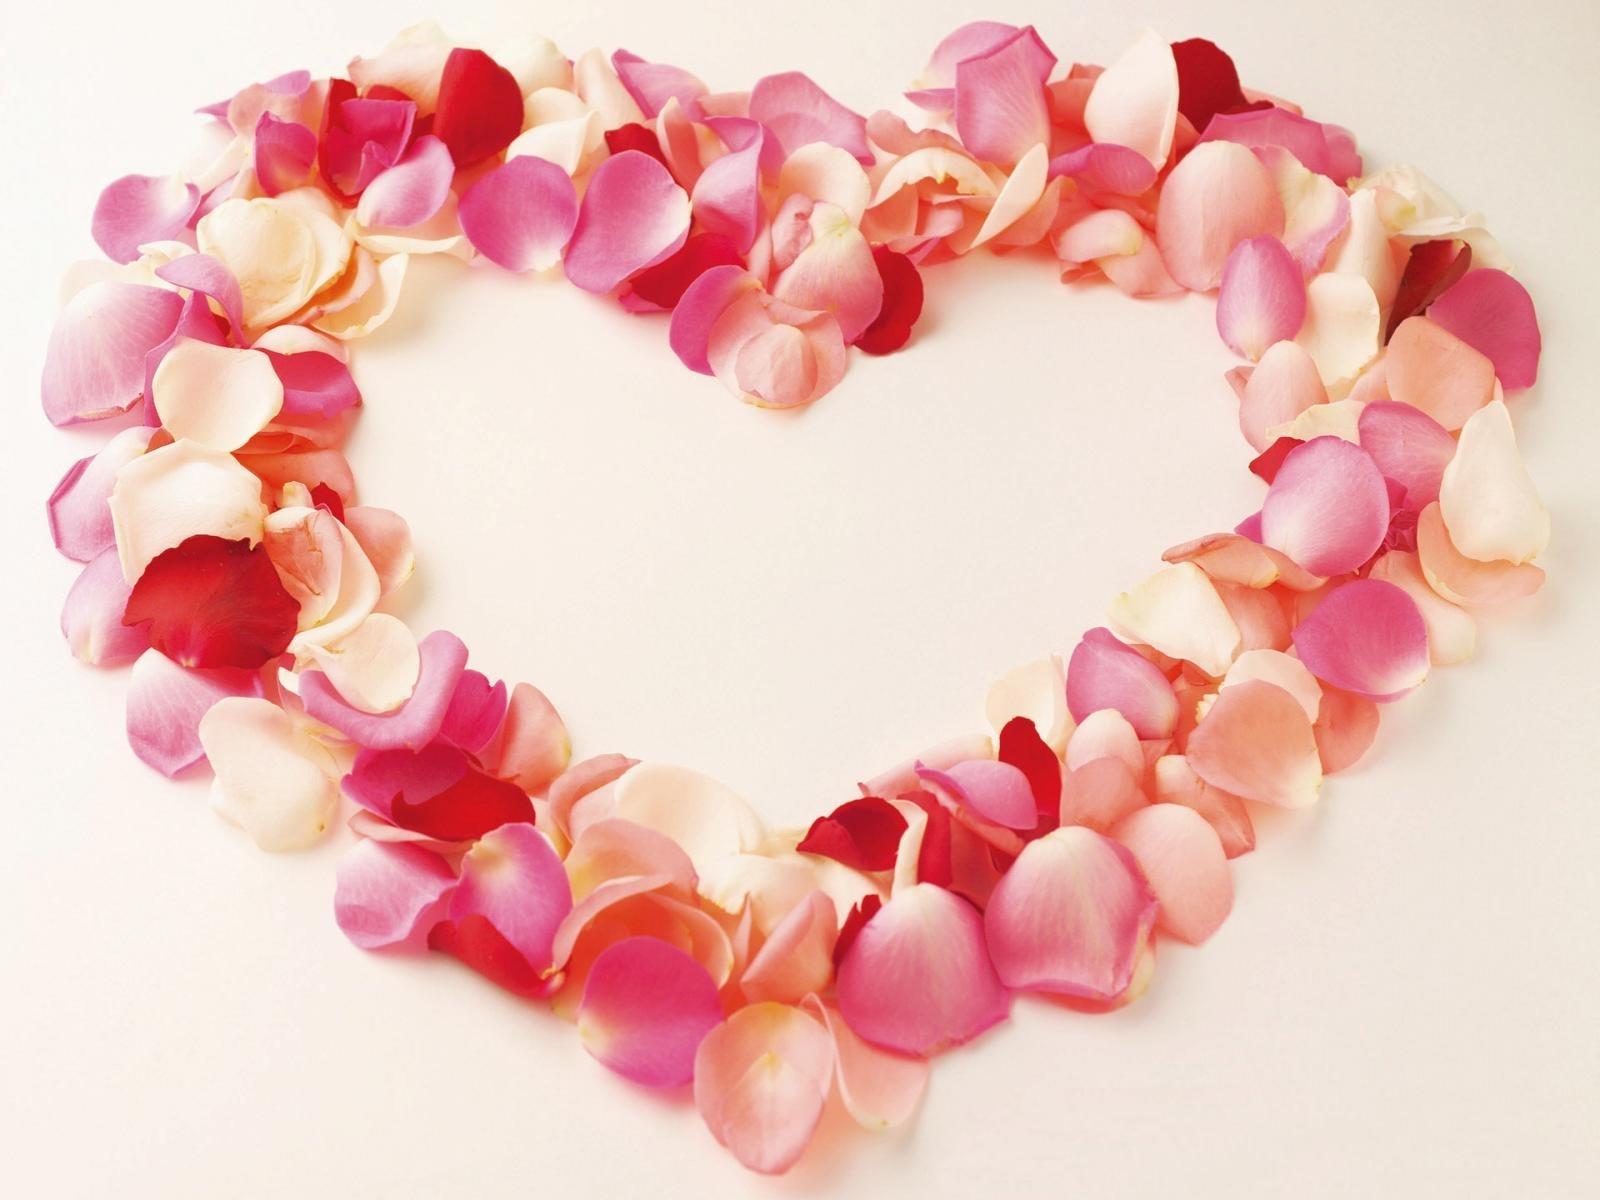 http://2.bp.blogspot.com/-AyCwprr82t0/UPD72ysYWmI/AAAAAAAALXc/dlcFE61HuQo/s1600/love-wallpaper.jpg